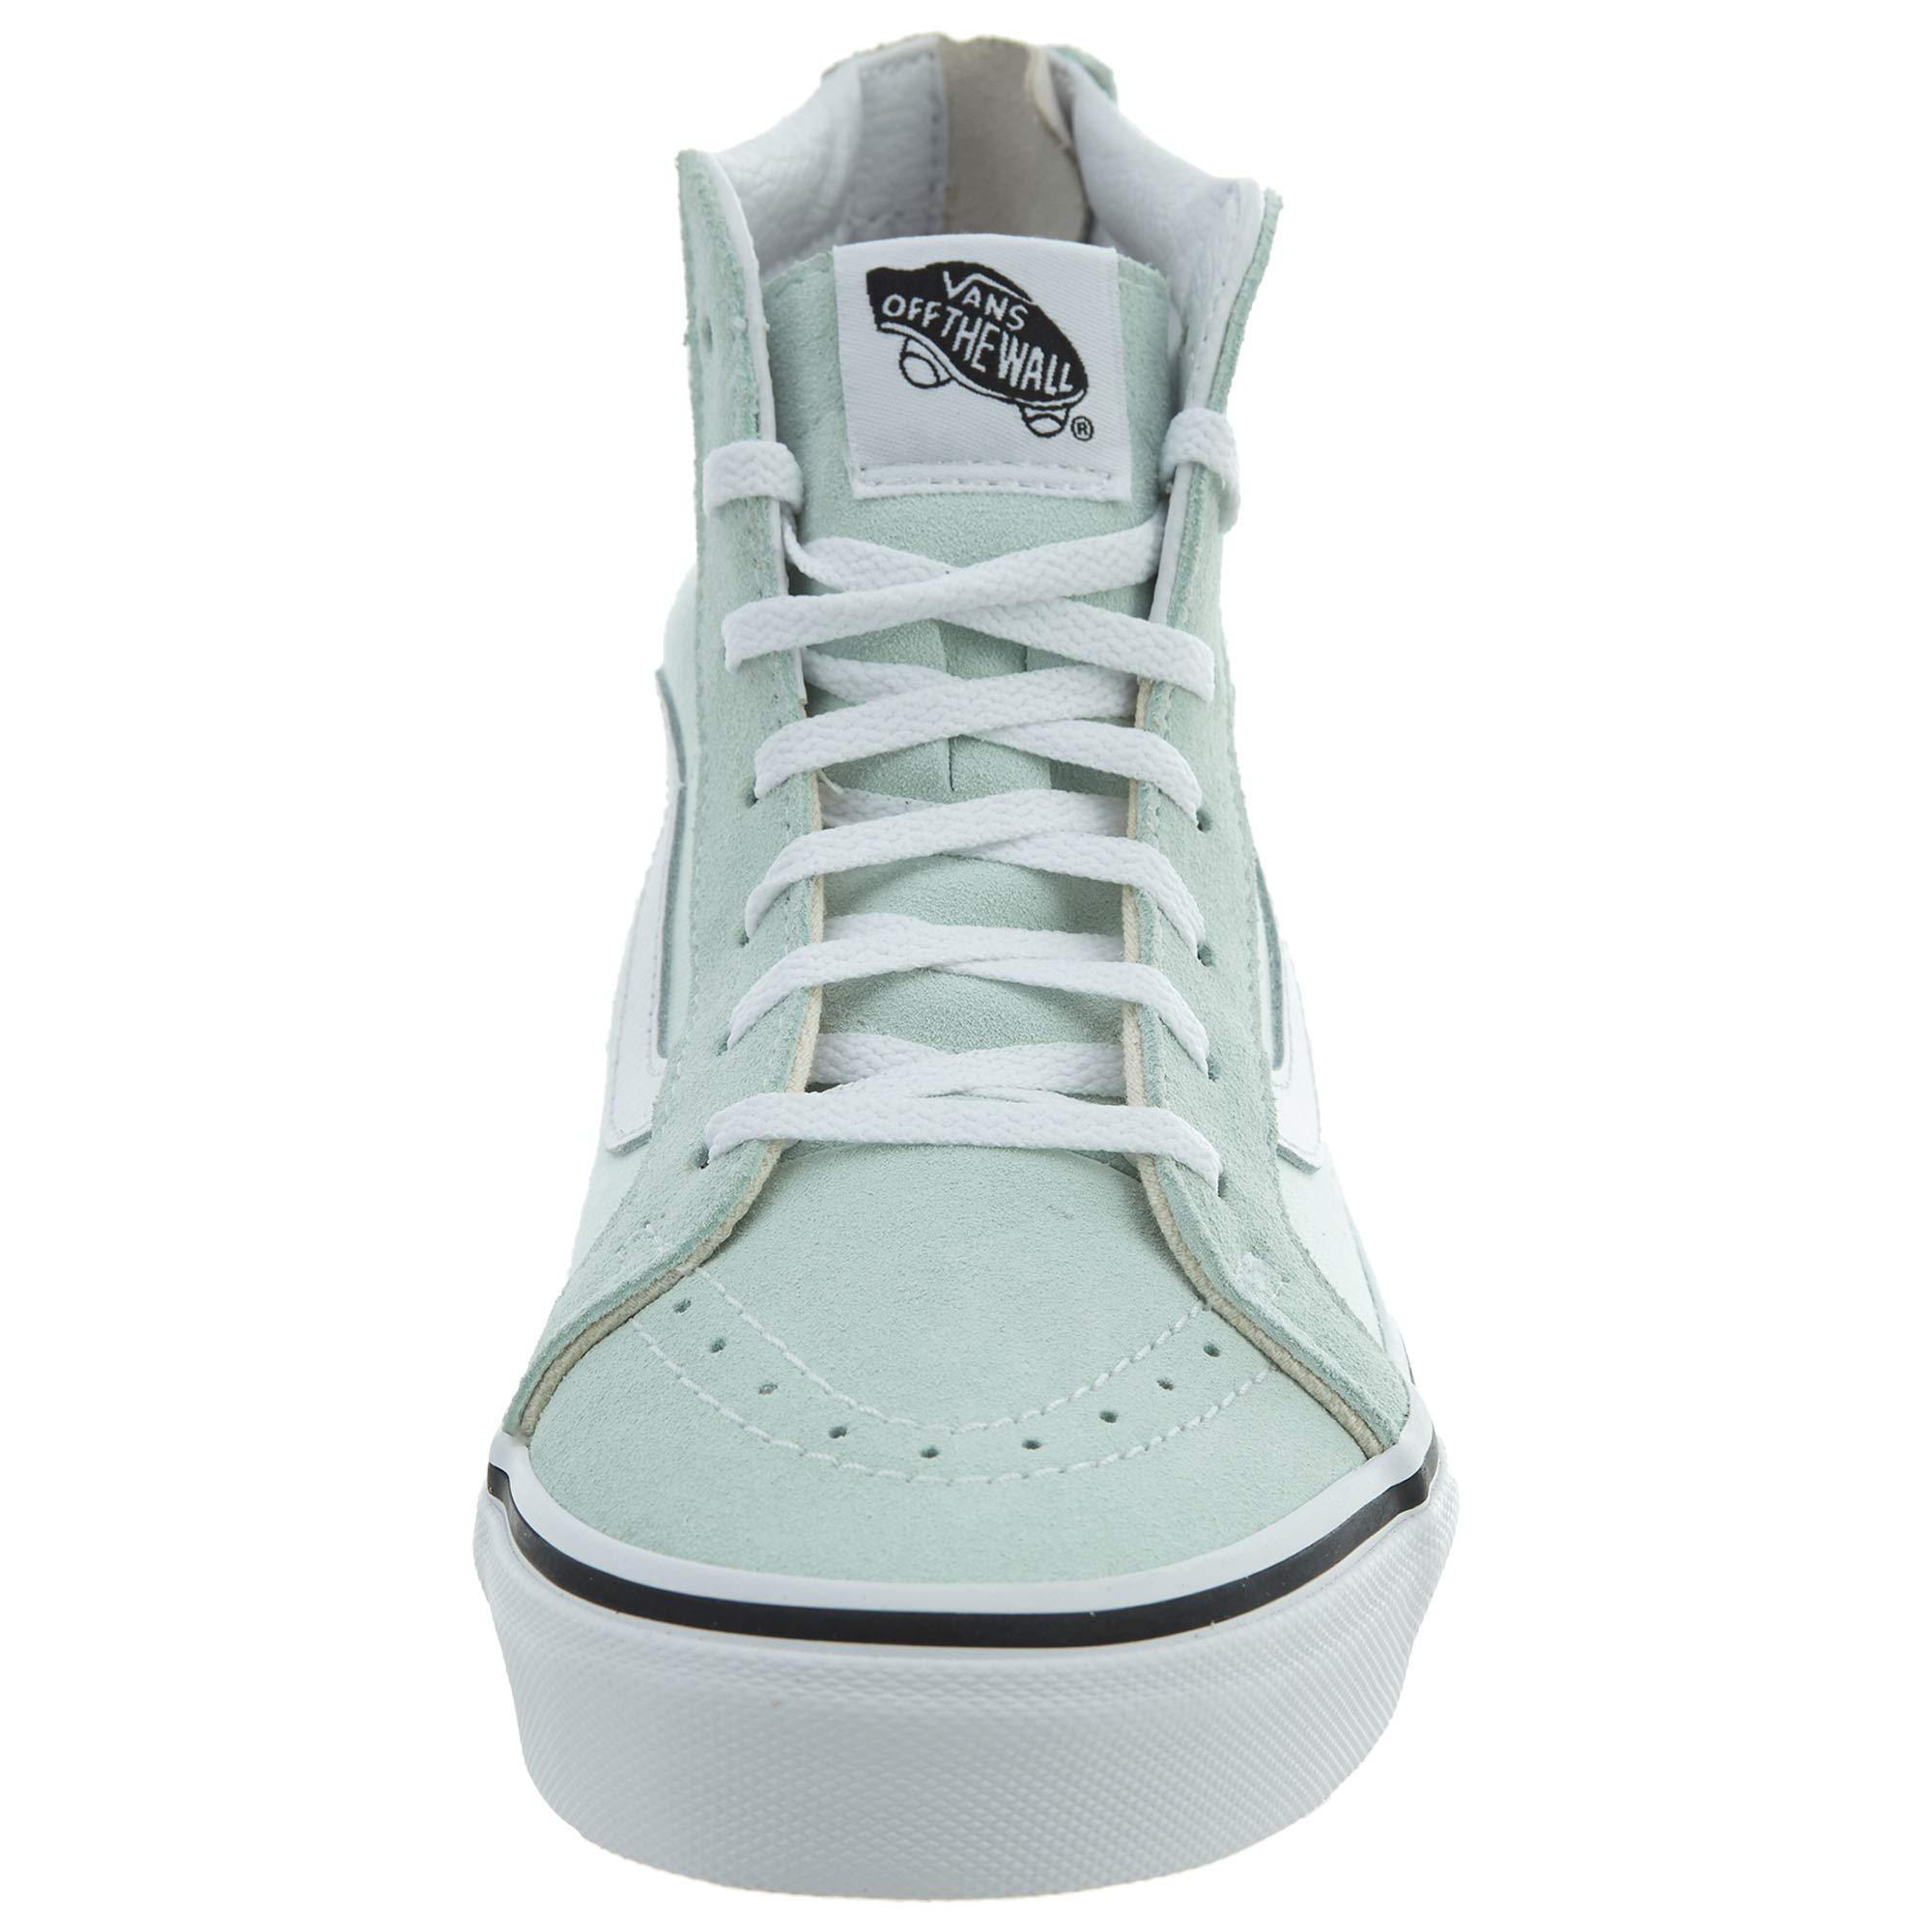 Vans Sk8-Hi Zip Preschool Skateboarding Shoe Big Kids Style : VN0A3276-QQ5 Size : 3